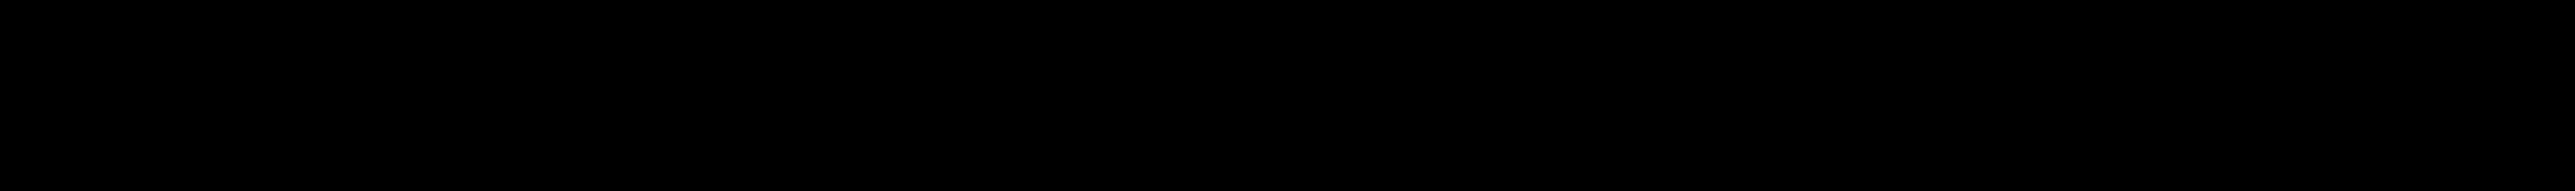 YWFT Unisect Black Oblique